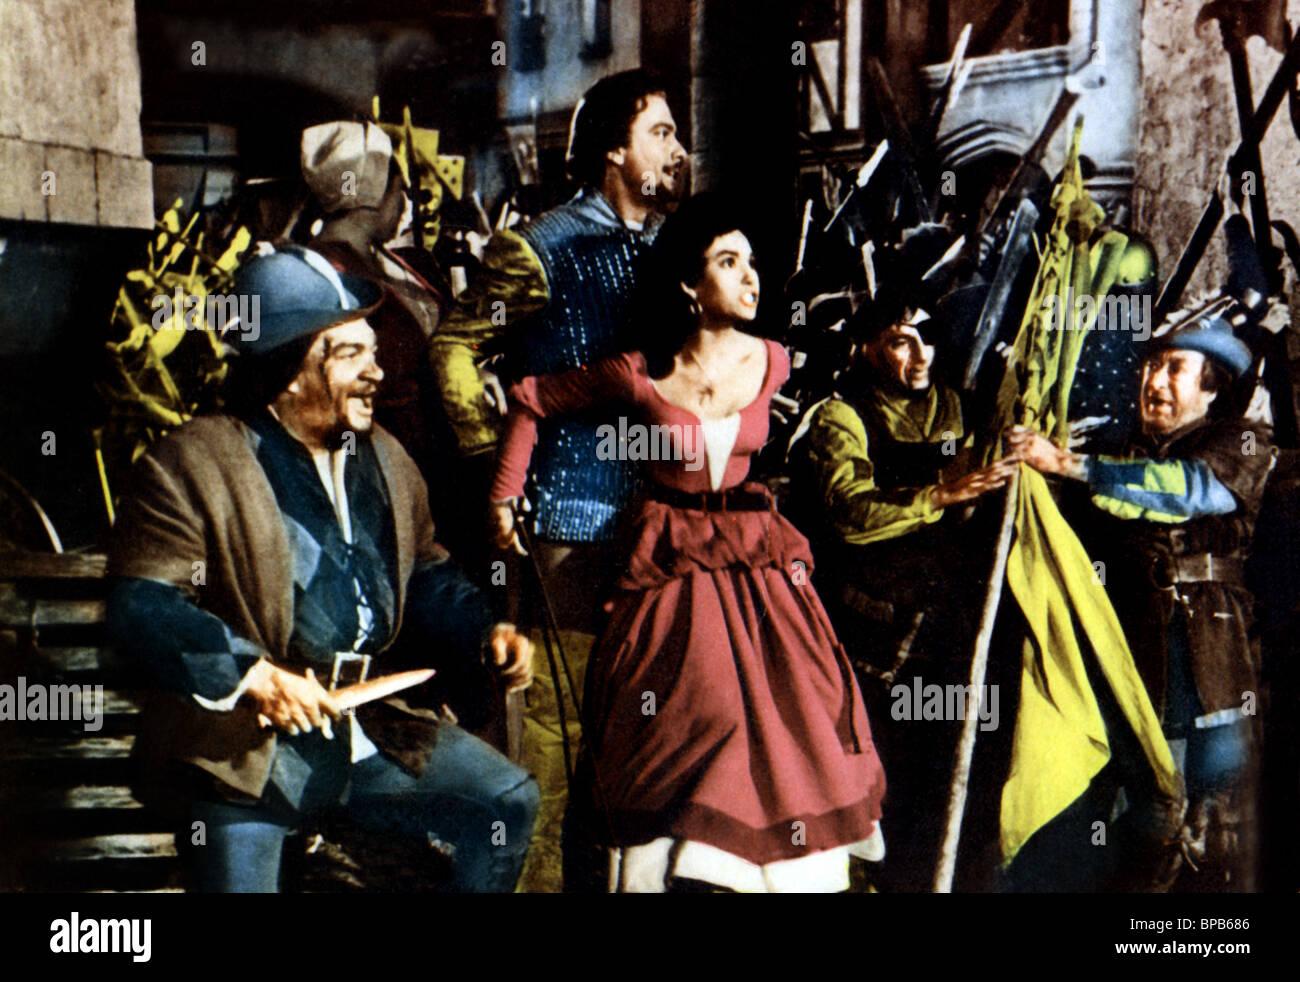 ORESTE KIRKOP, KATHRYN GRAYSON, THE VAGABOND KING, 1956 Stock Photo